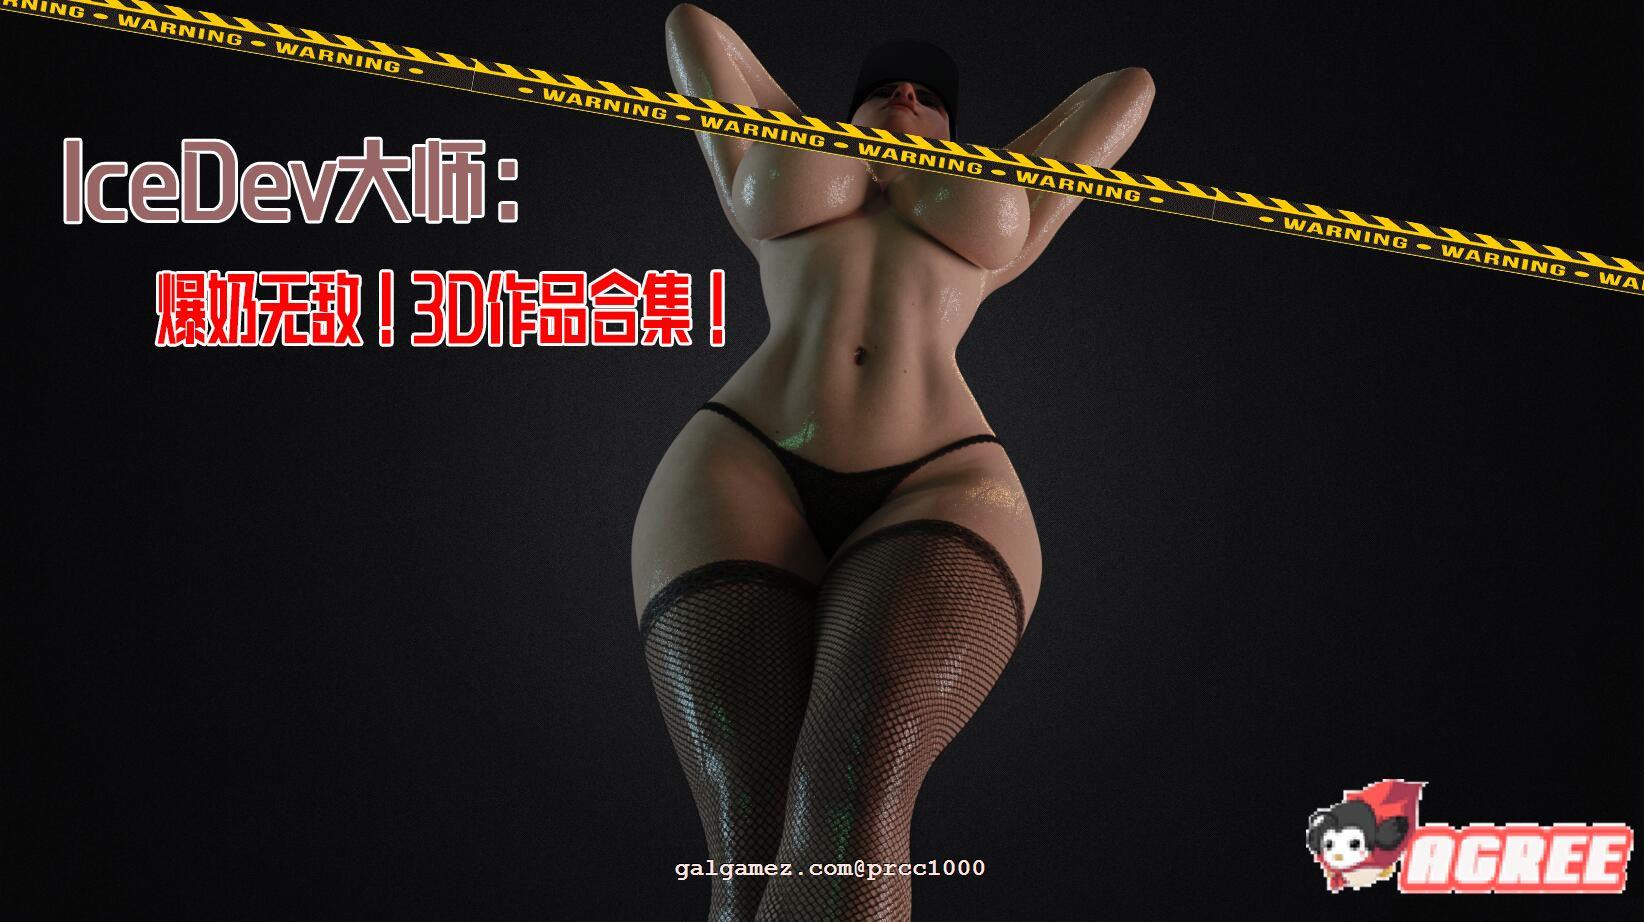 【3D同人/全动态】IceDev大师:无敌爆汝!极品社保资源合集[动画+设定集+CG]【3G】 1